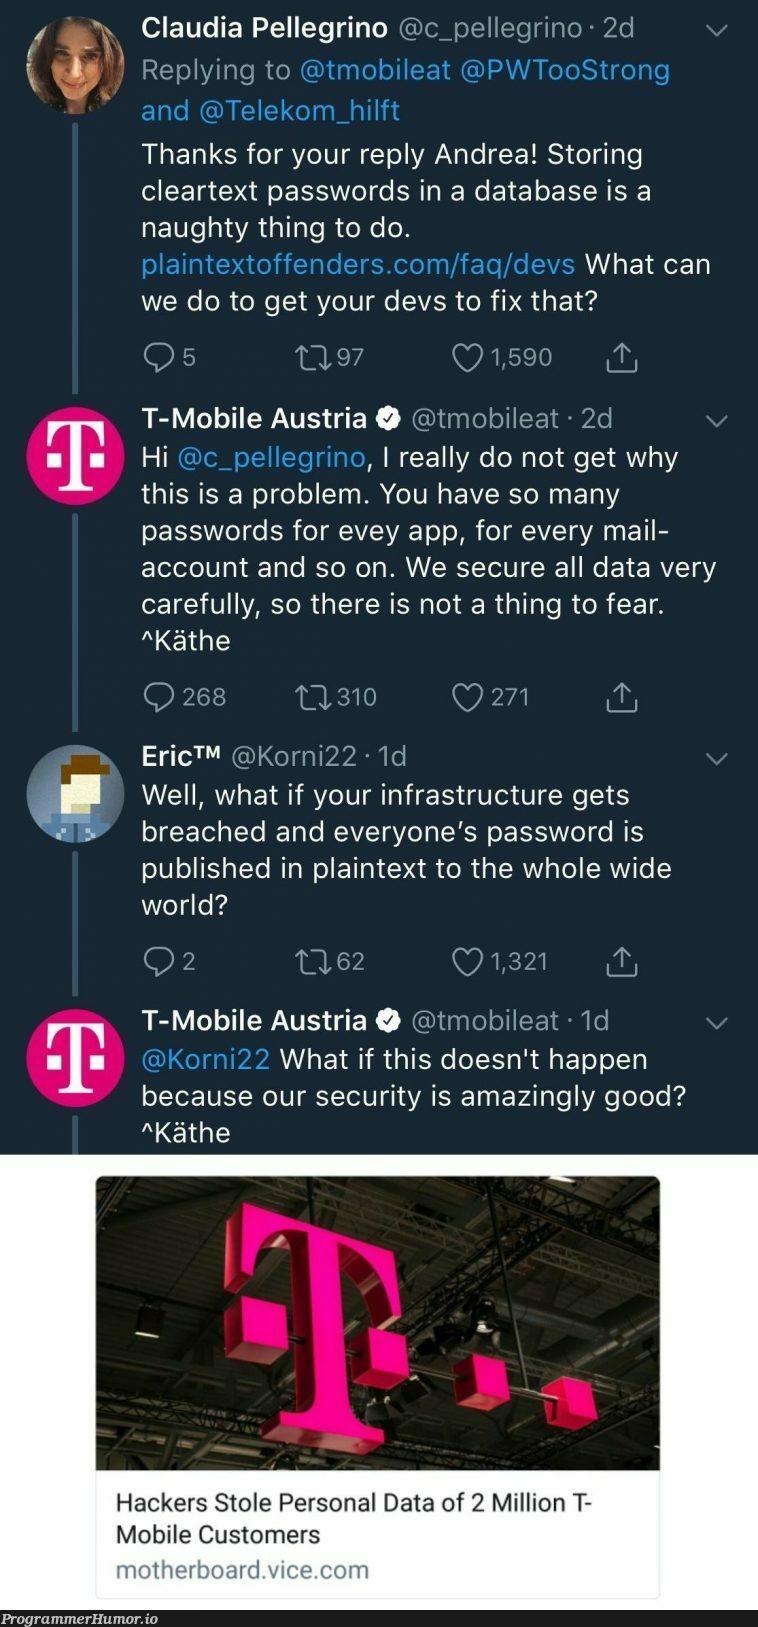 Amazingly good security | hacker-memes, data-memes, password-memes, security-memes, devs-memes, database-memes, fix-memes, rds-memes, ide-memes | ProgrammerHumor.io